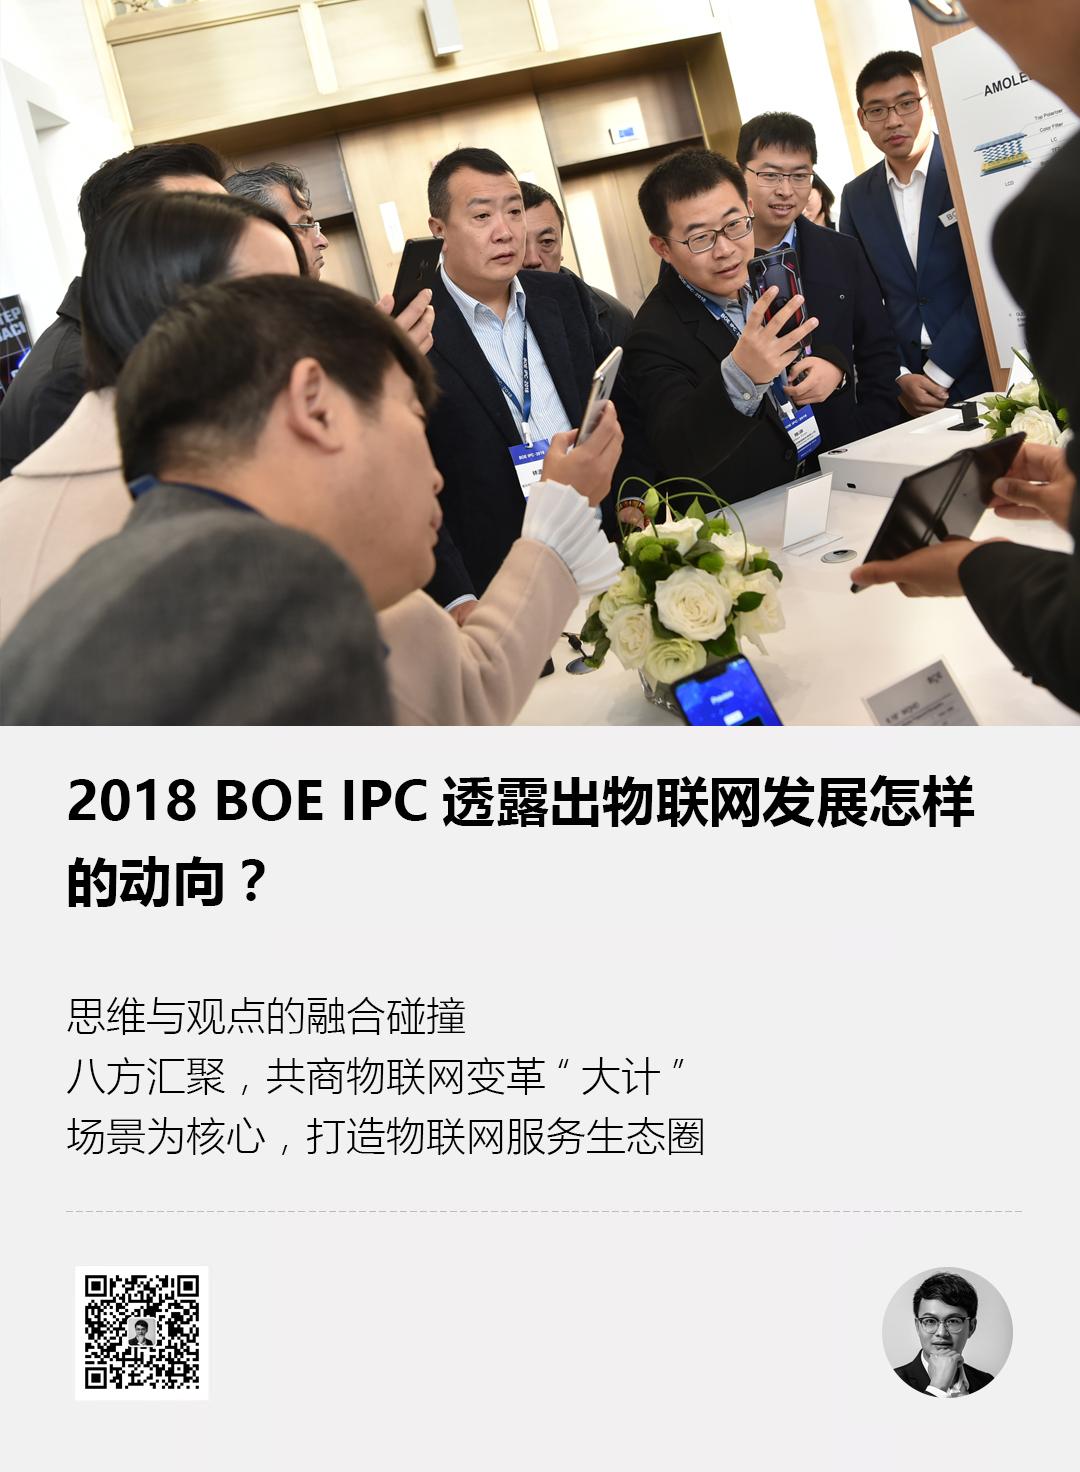 http://www.reviewcode.cn/rengongzhinen/9136.html